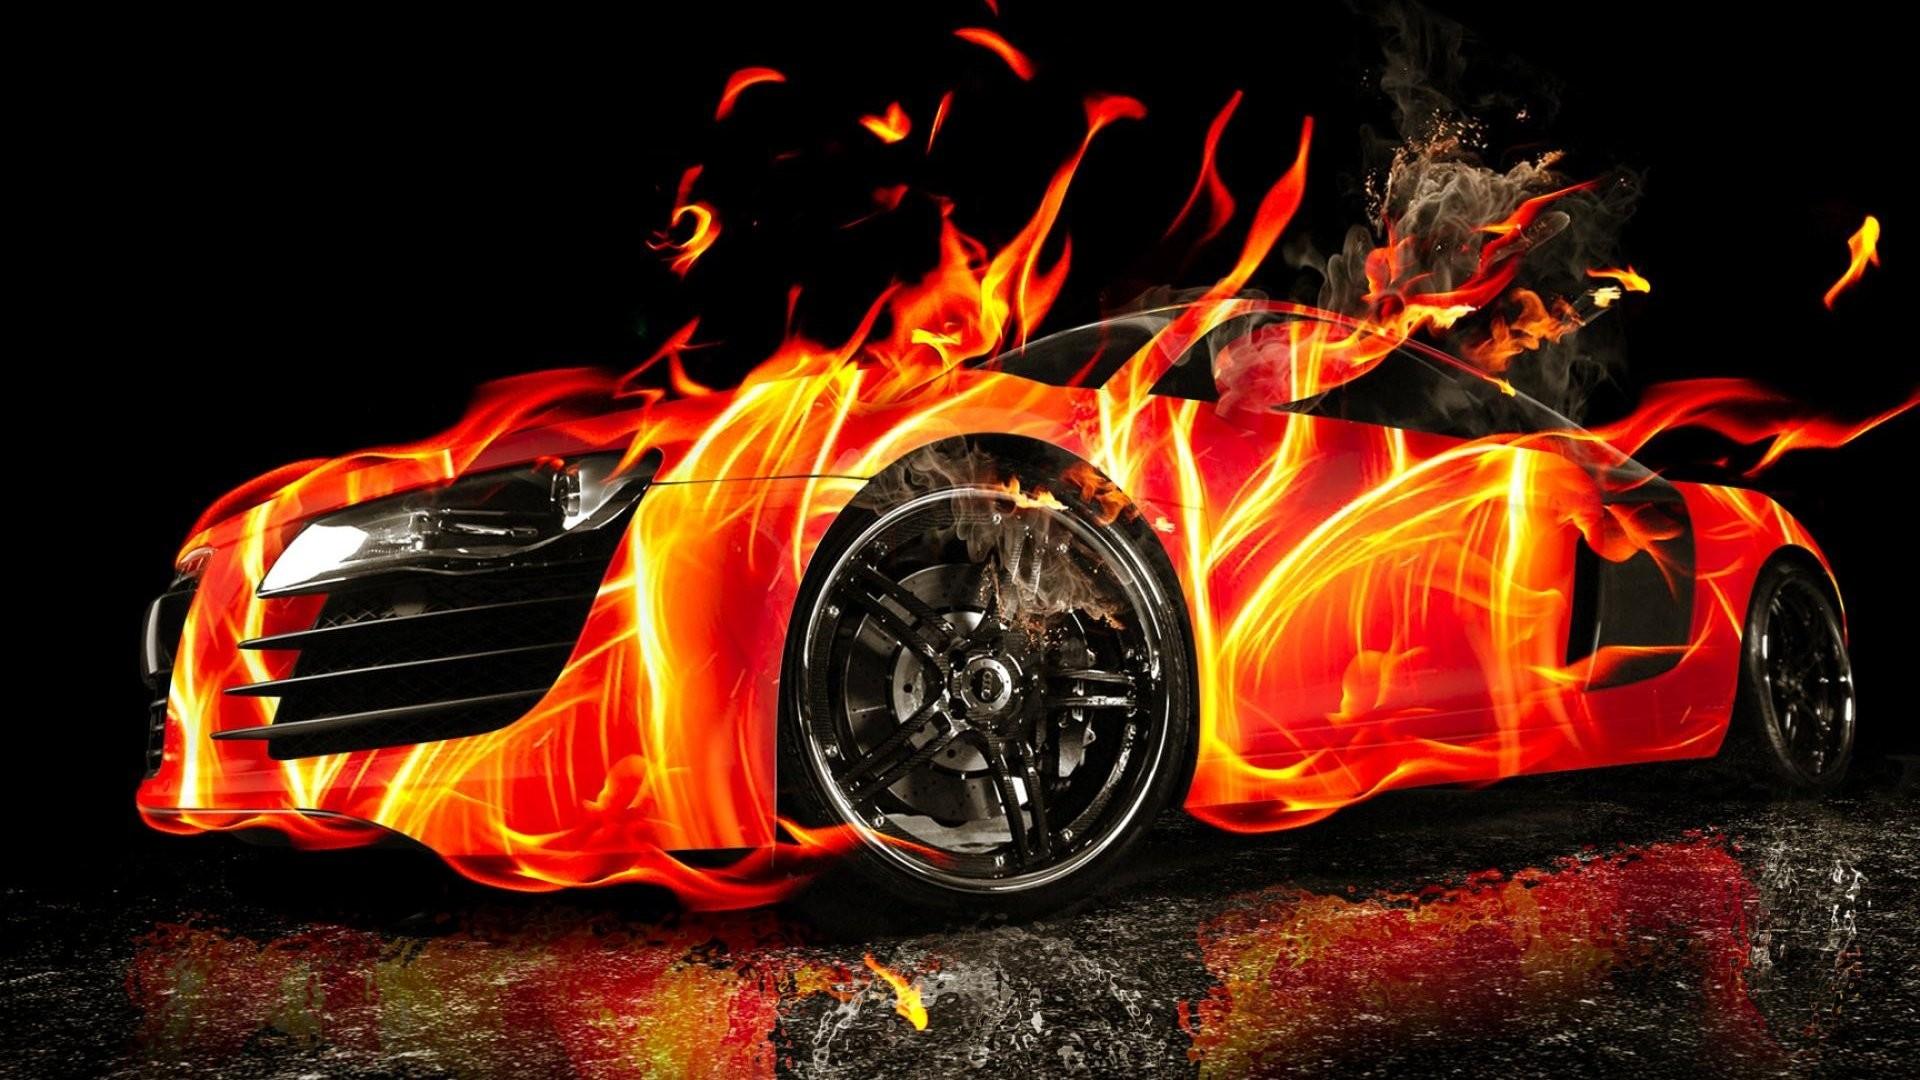 Cars Wallpaper Download 1024x576 Wallpaper Teahub Io